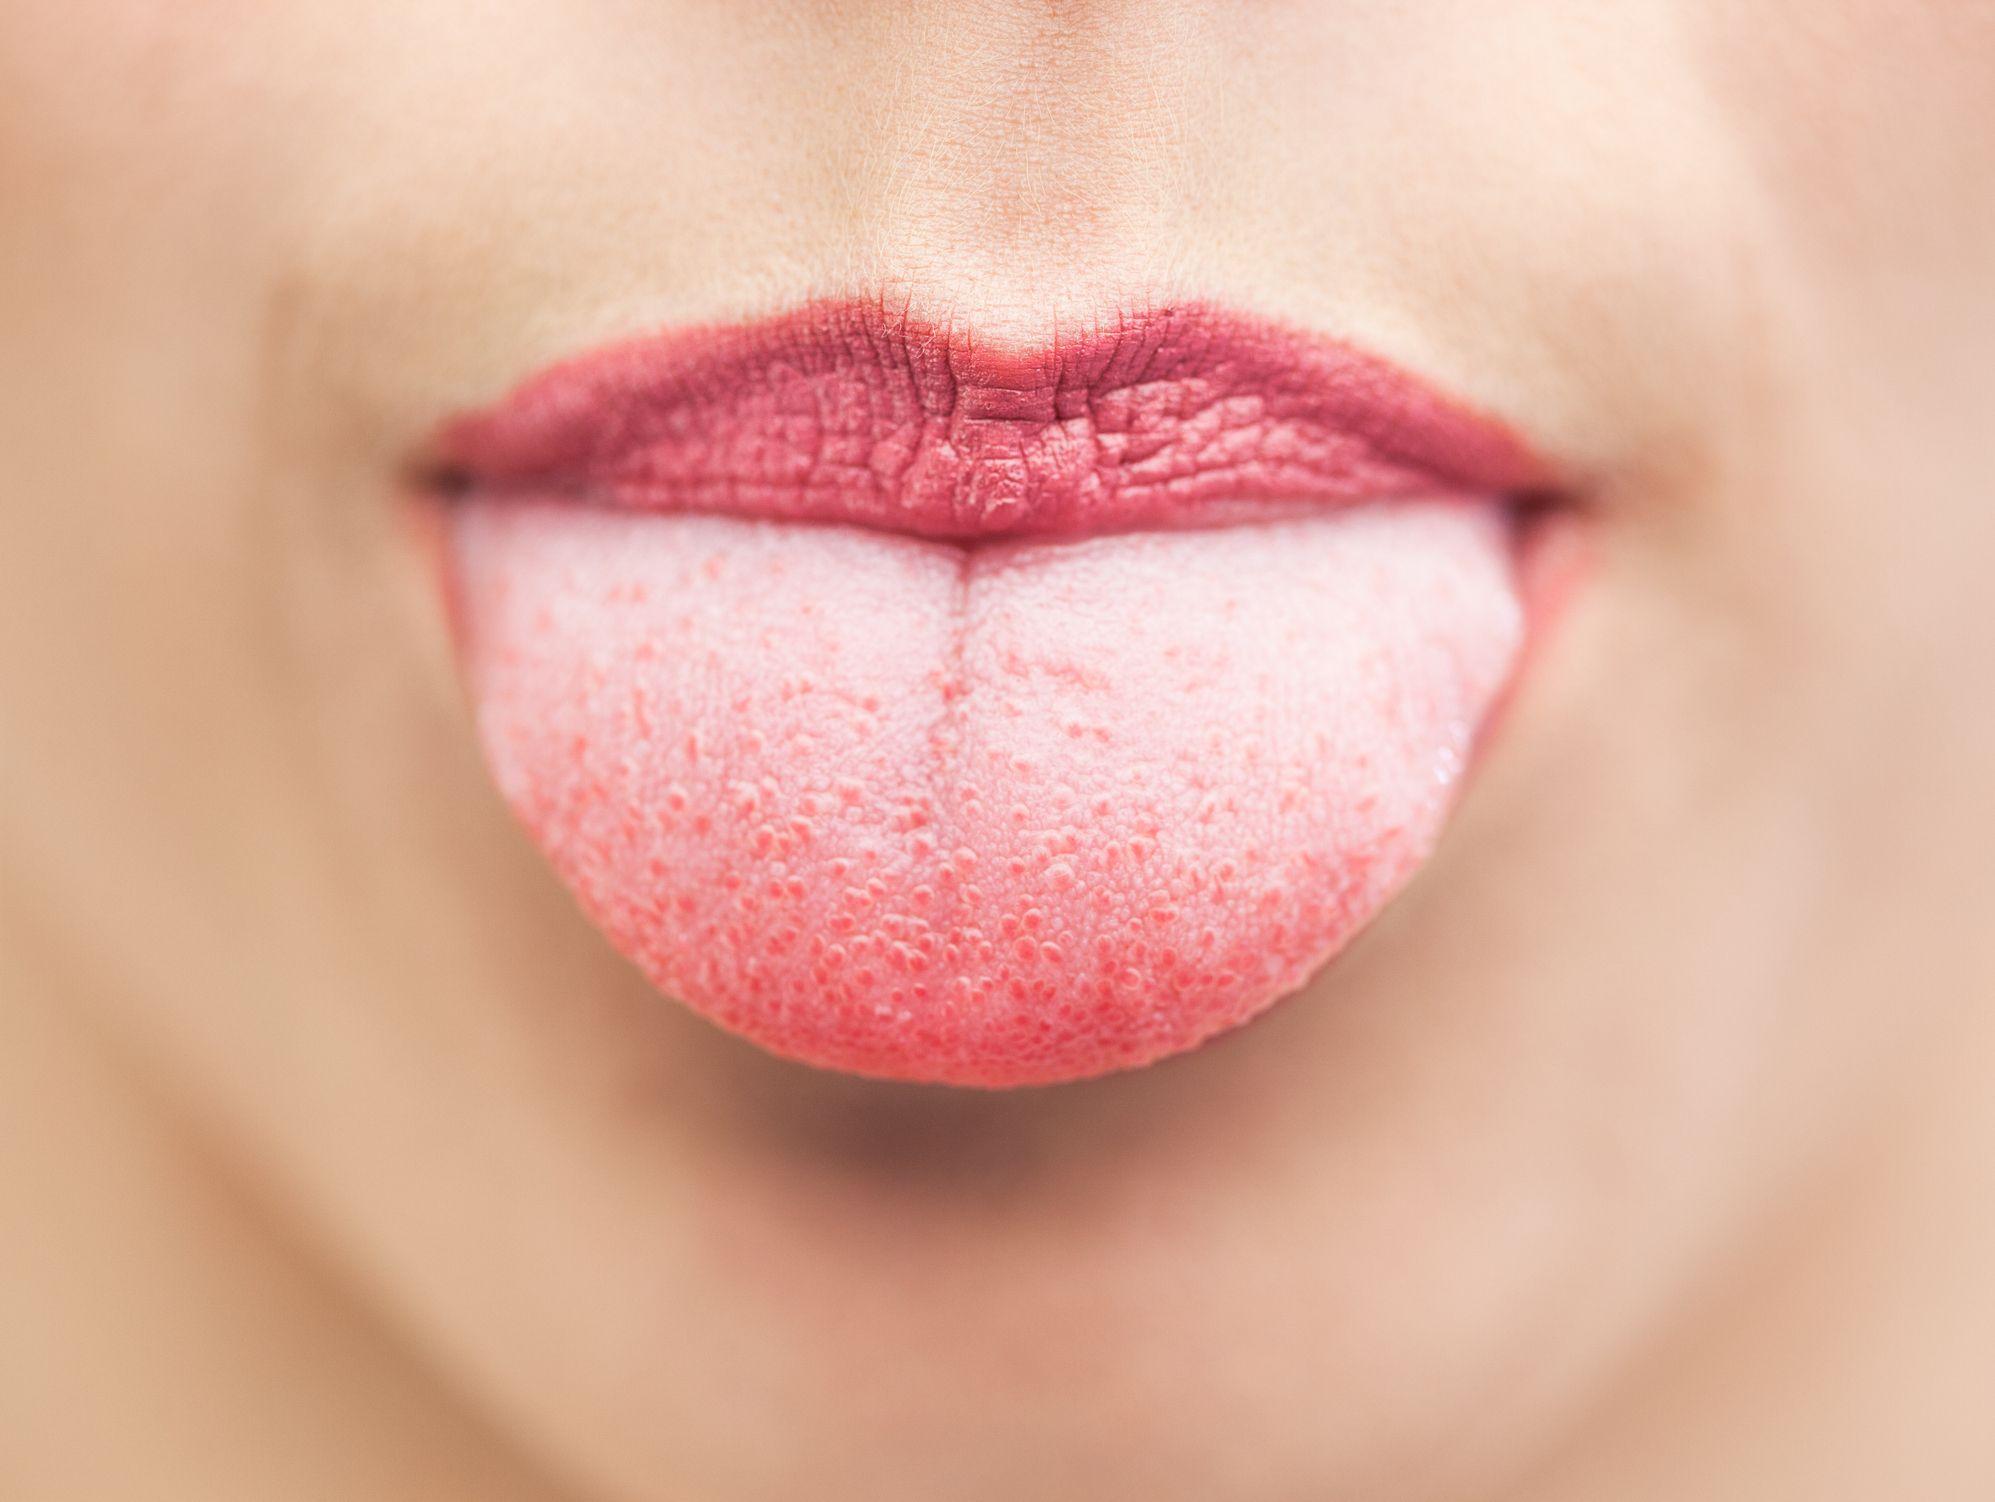 inflammation of tongue papillae